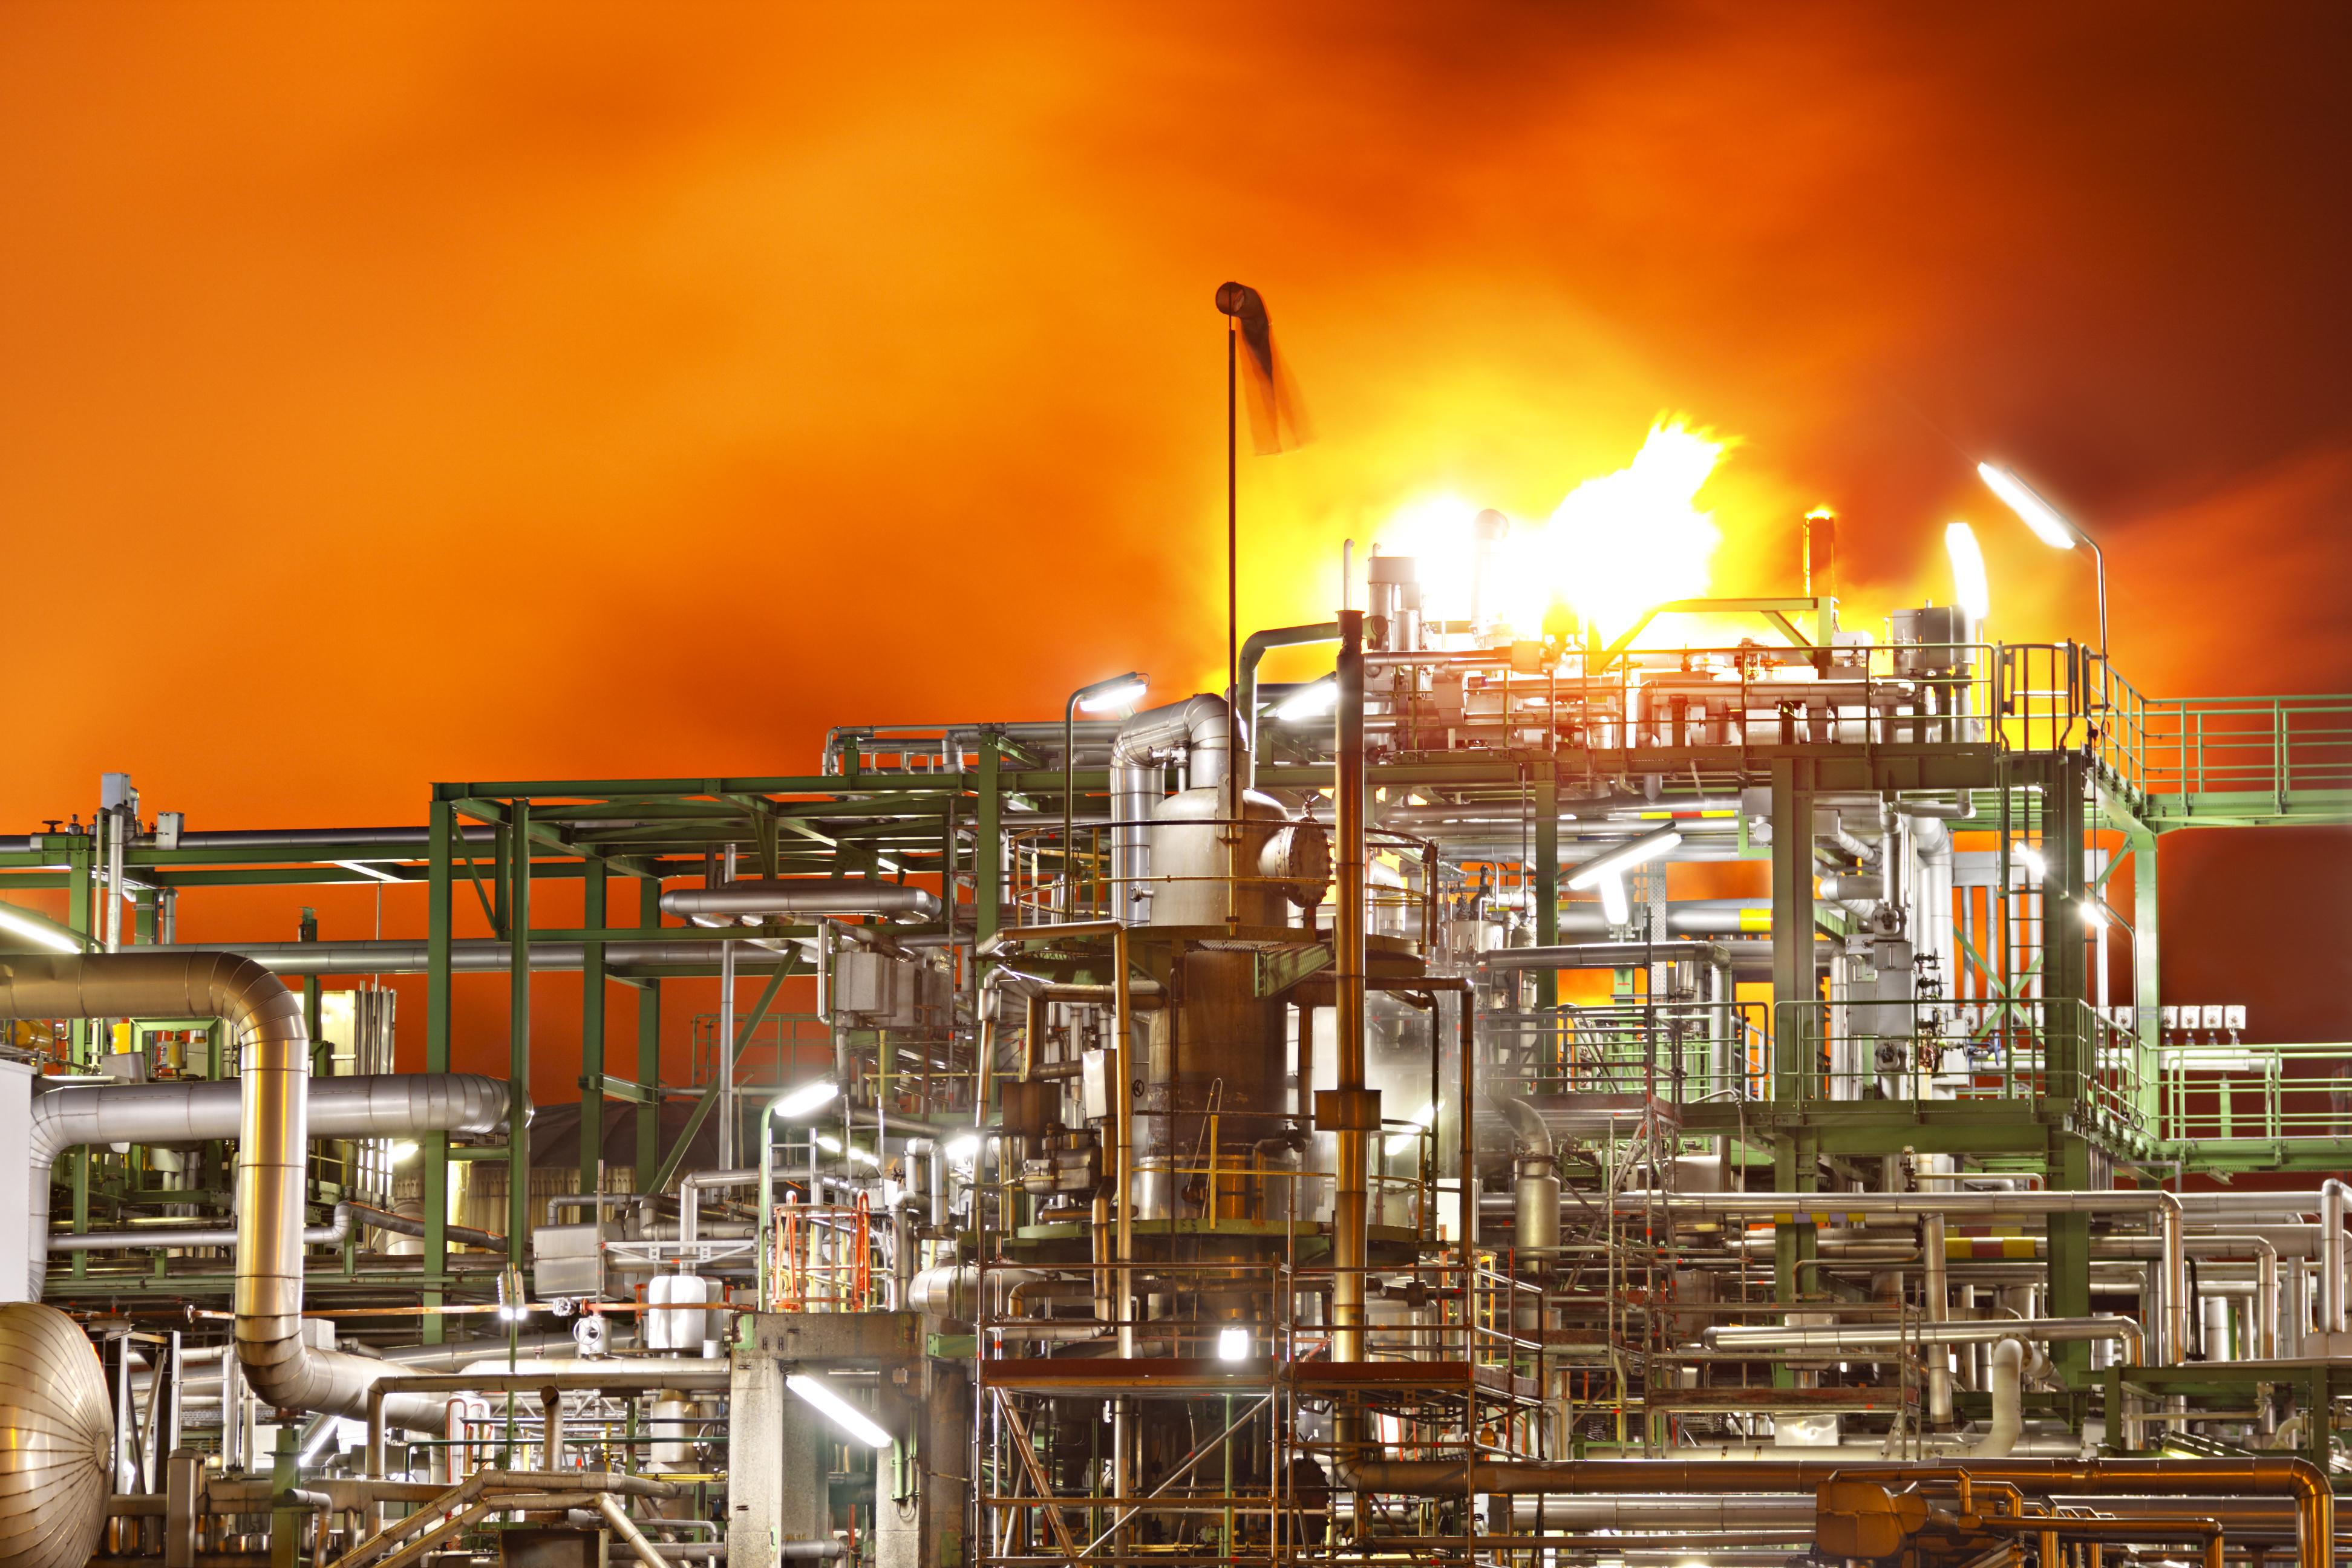 uploads///Saudi Aramco Fire crude oil